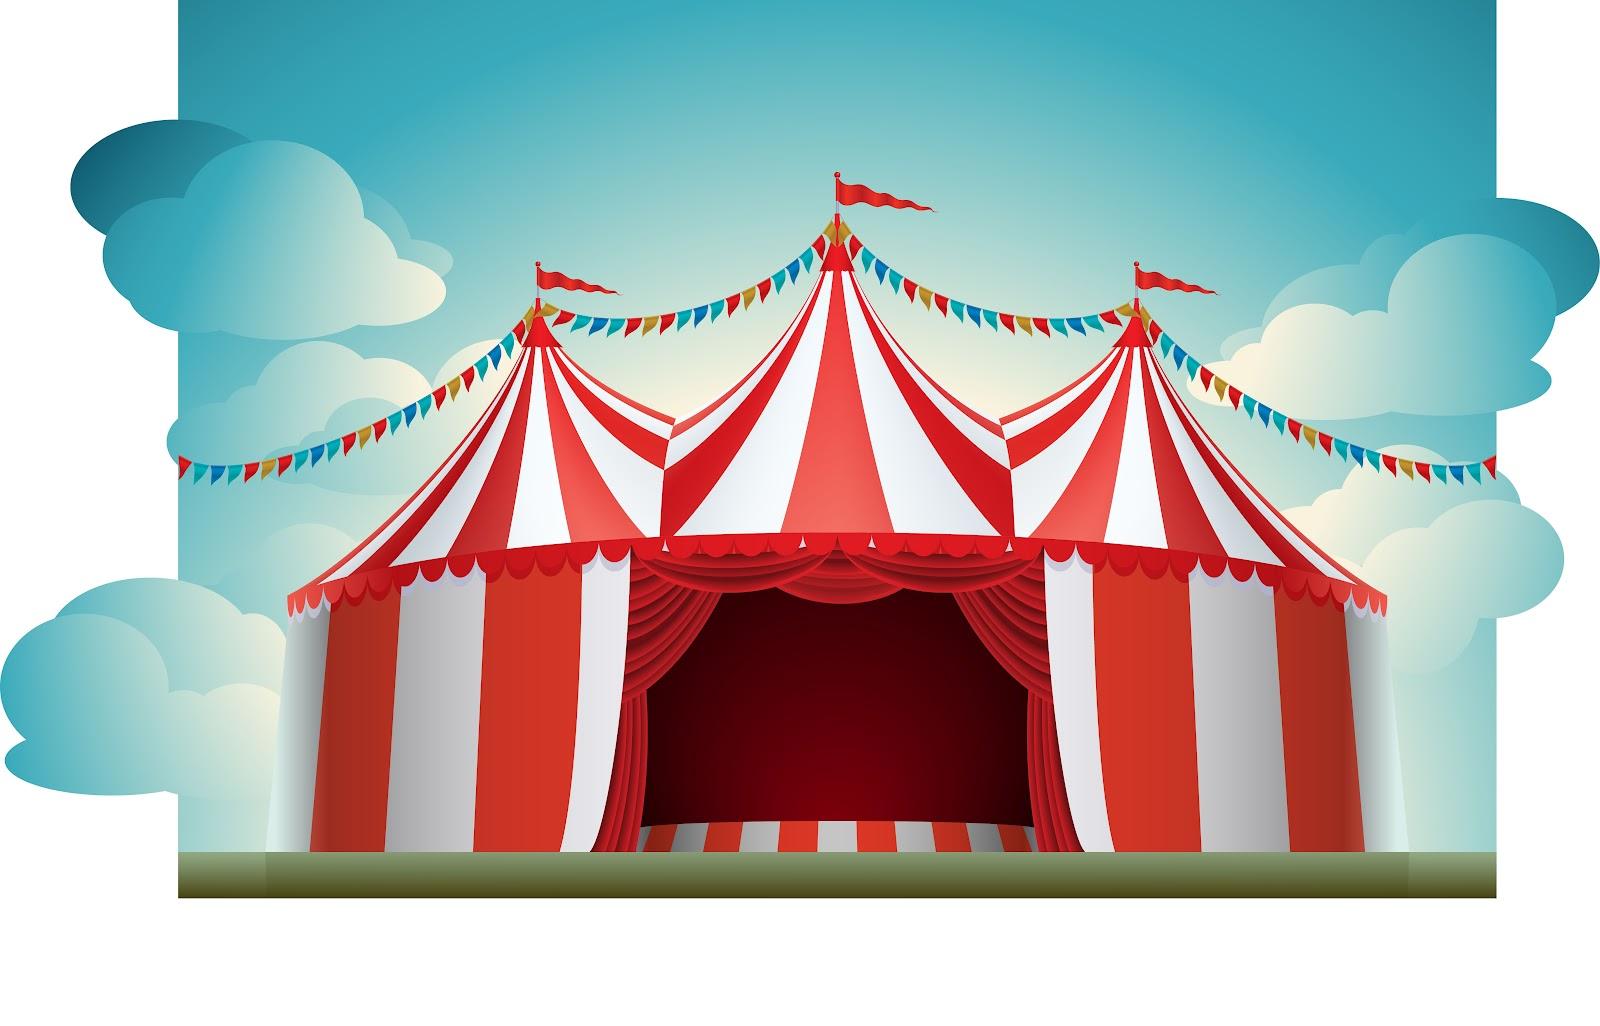 Circus clipart party tent. Free pics download clip